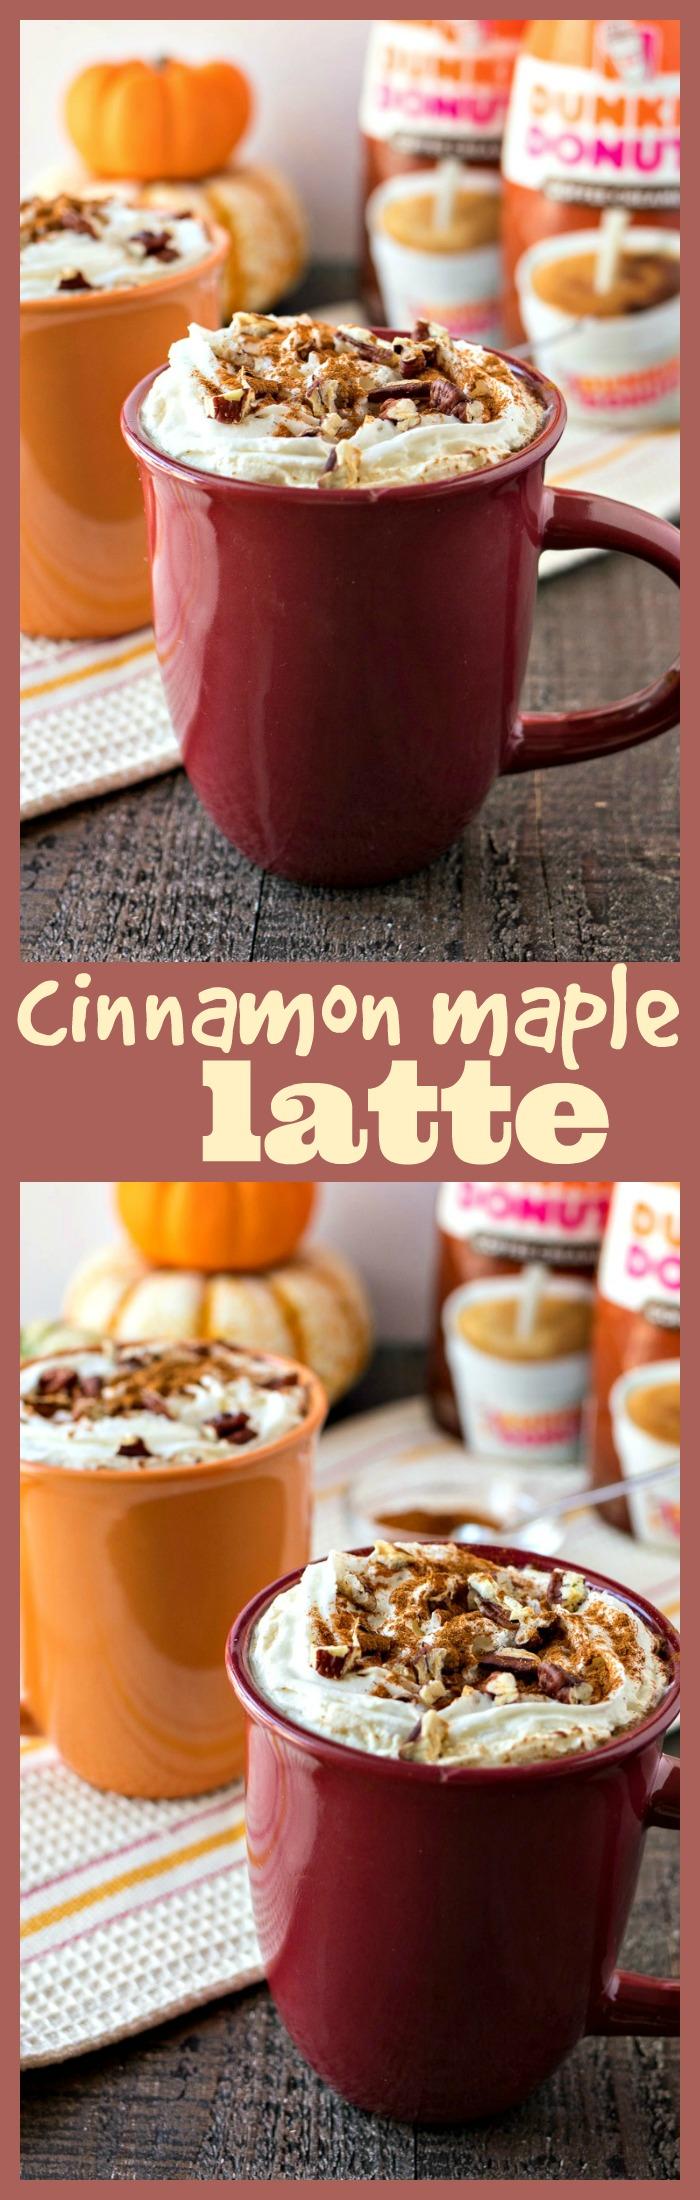 Cinnamon Maple Latte photo collage